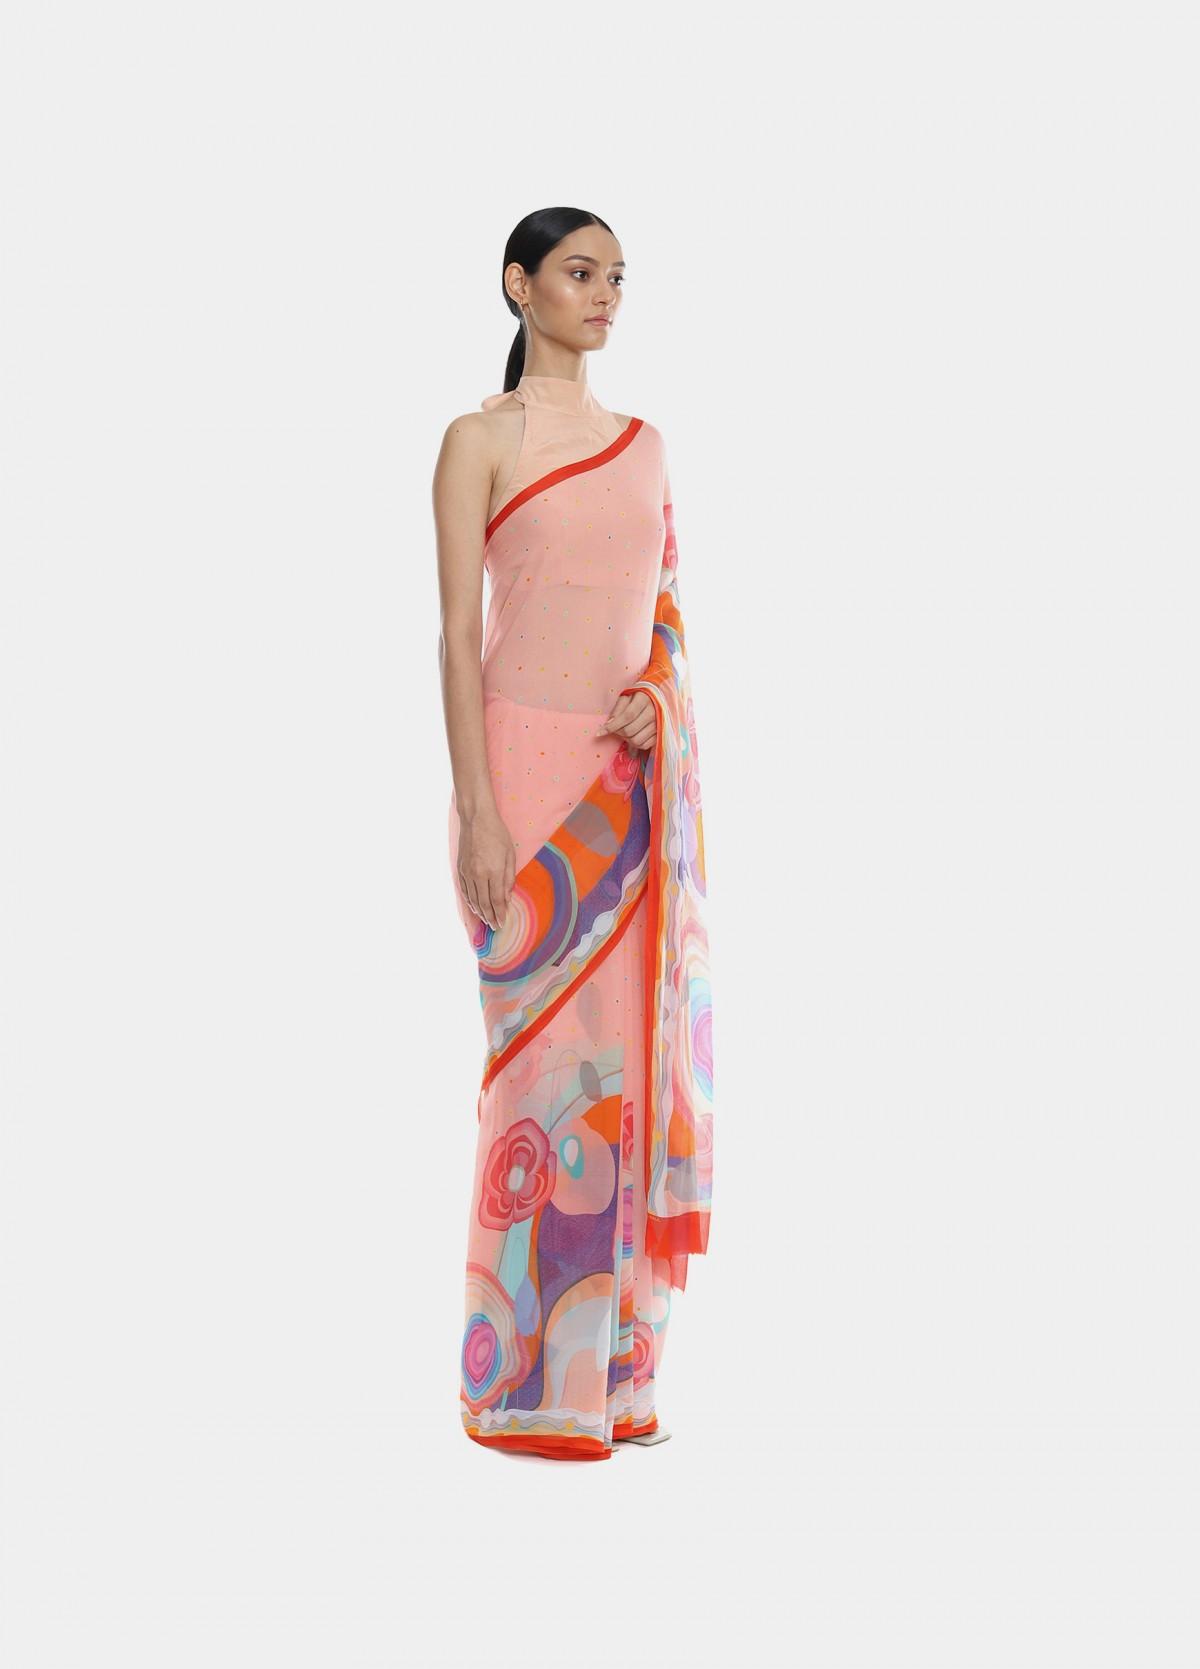 The Poppy Garden Sari